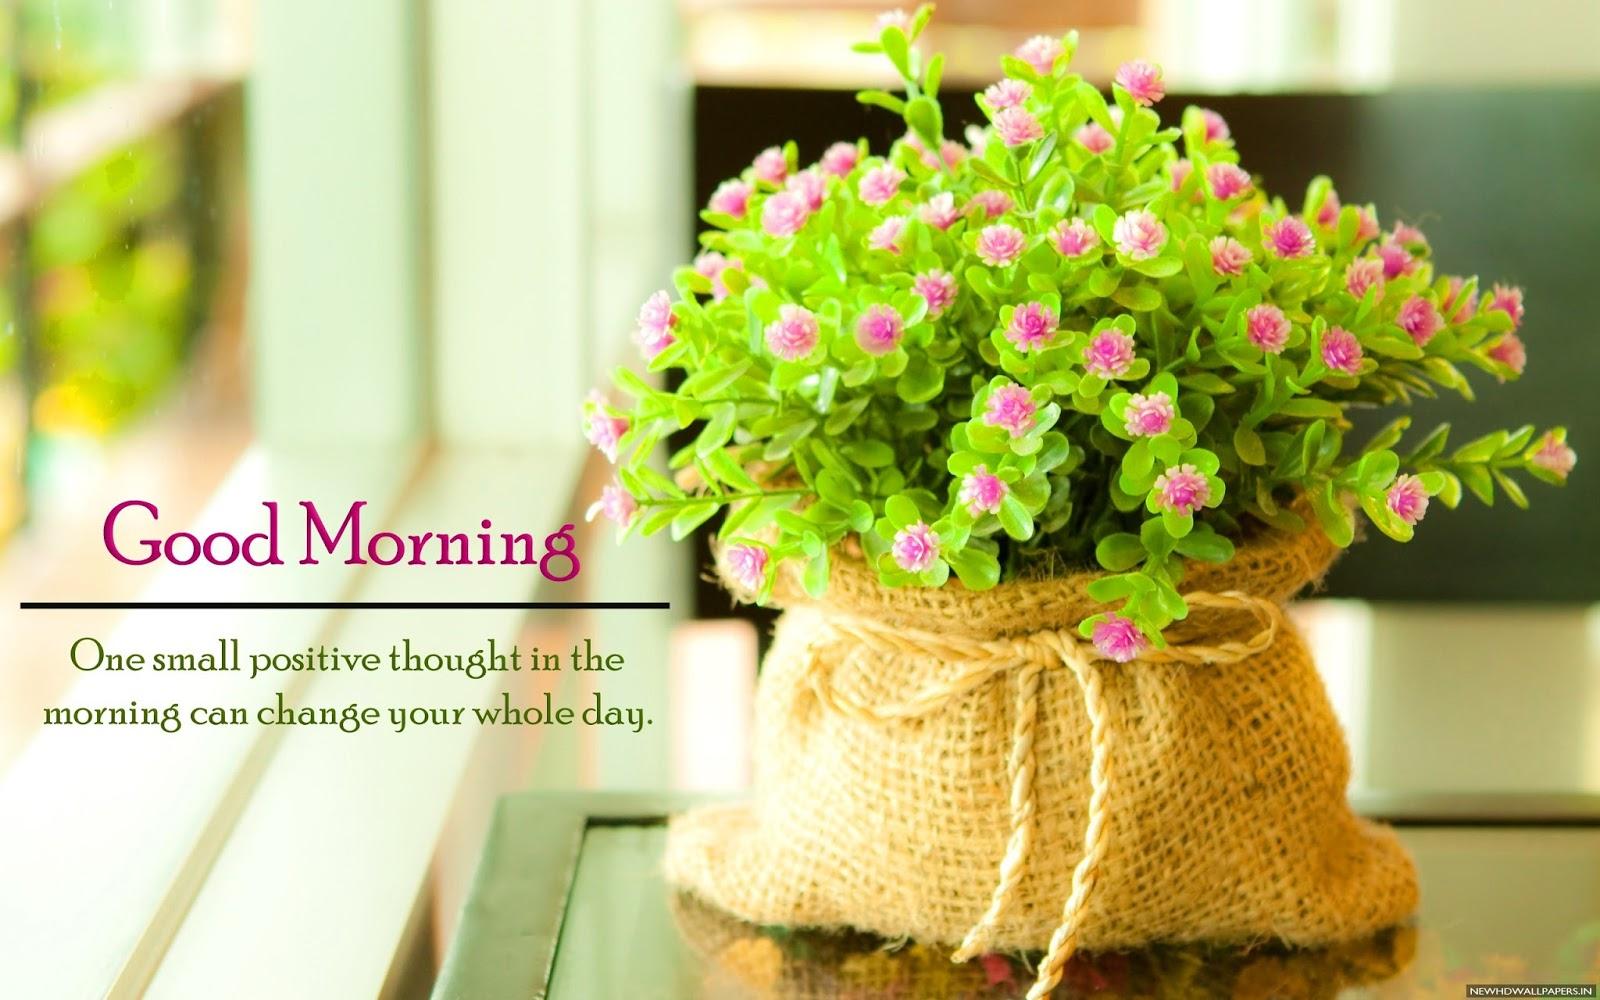 Wallpaper download morning - Good Morning Hd Images Good Morning Hd Wallpaper Good Morning Hd Photos Good